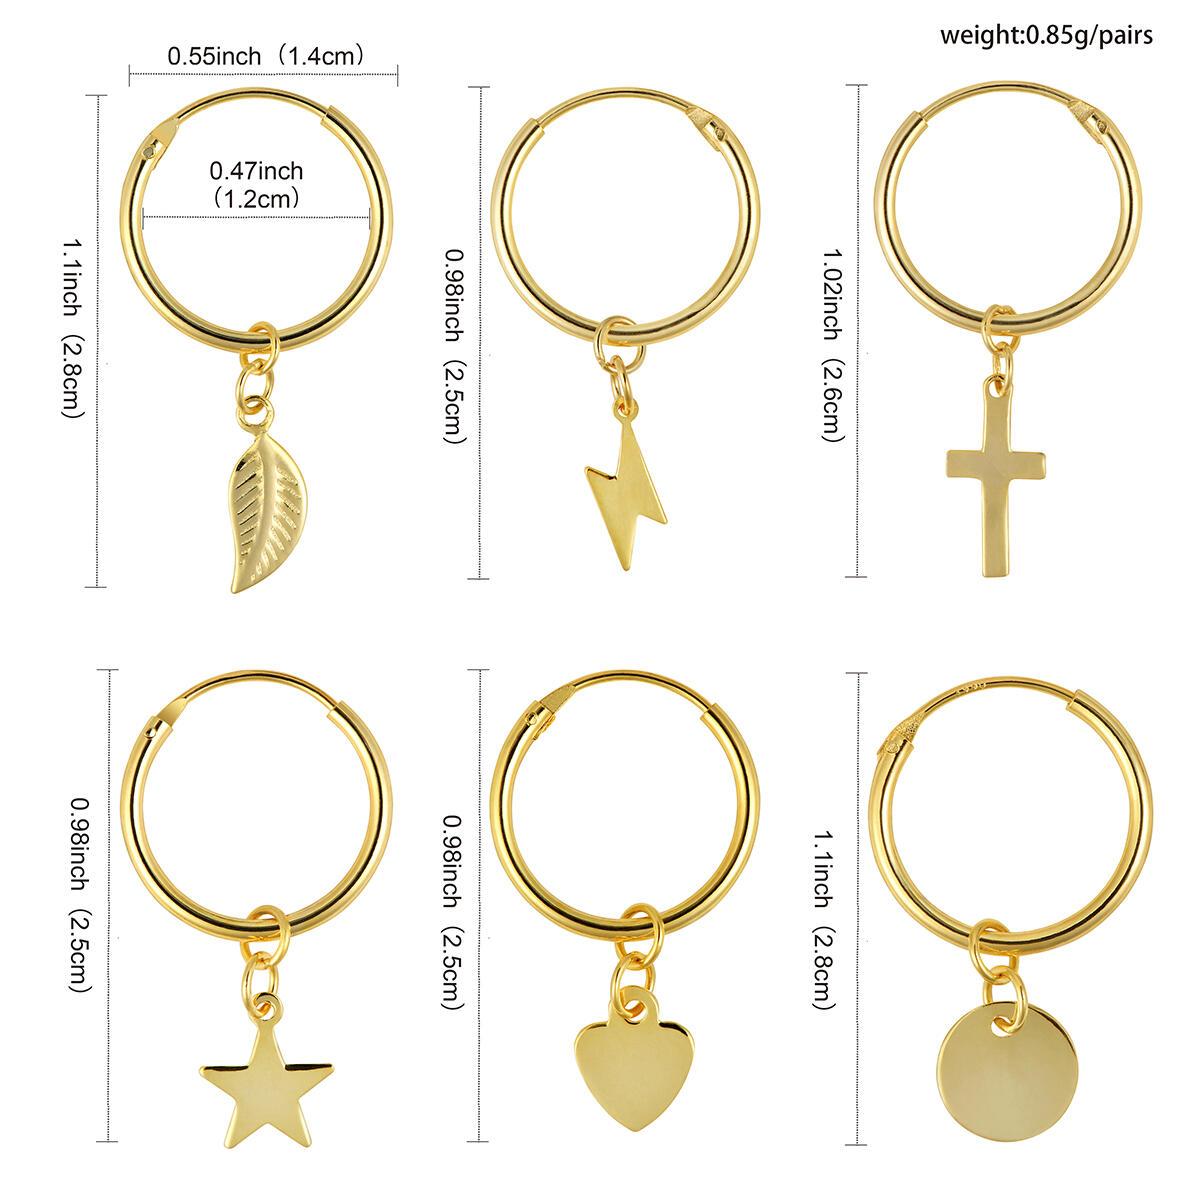 YeGieonr Small Dangle Hoop Earrings-Disc Hoop Earrings -925 Sterling Silver with 14k Gold Plated,Minimalist Dainty Huggie Hoop Earrings with Tiny Charms For Women/girls/teens